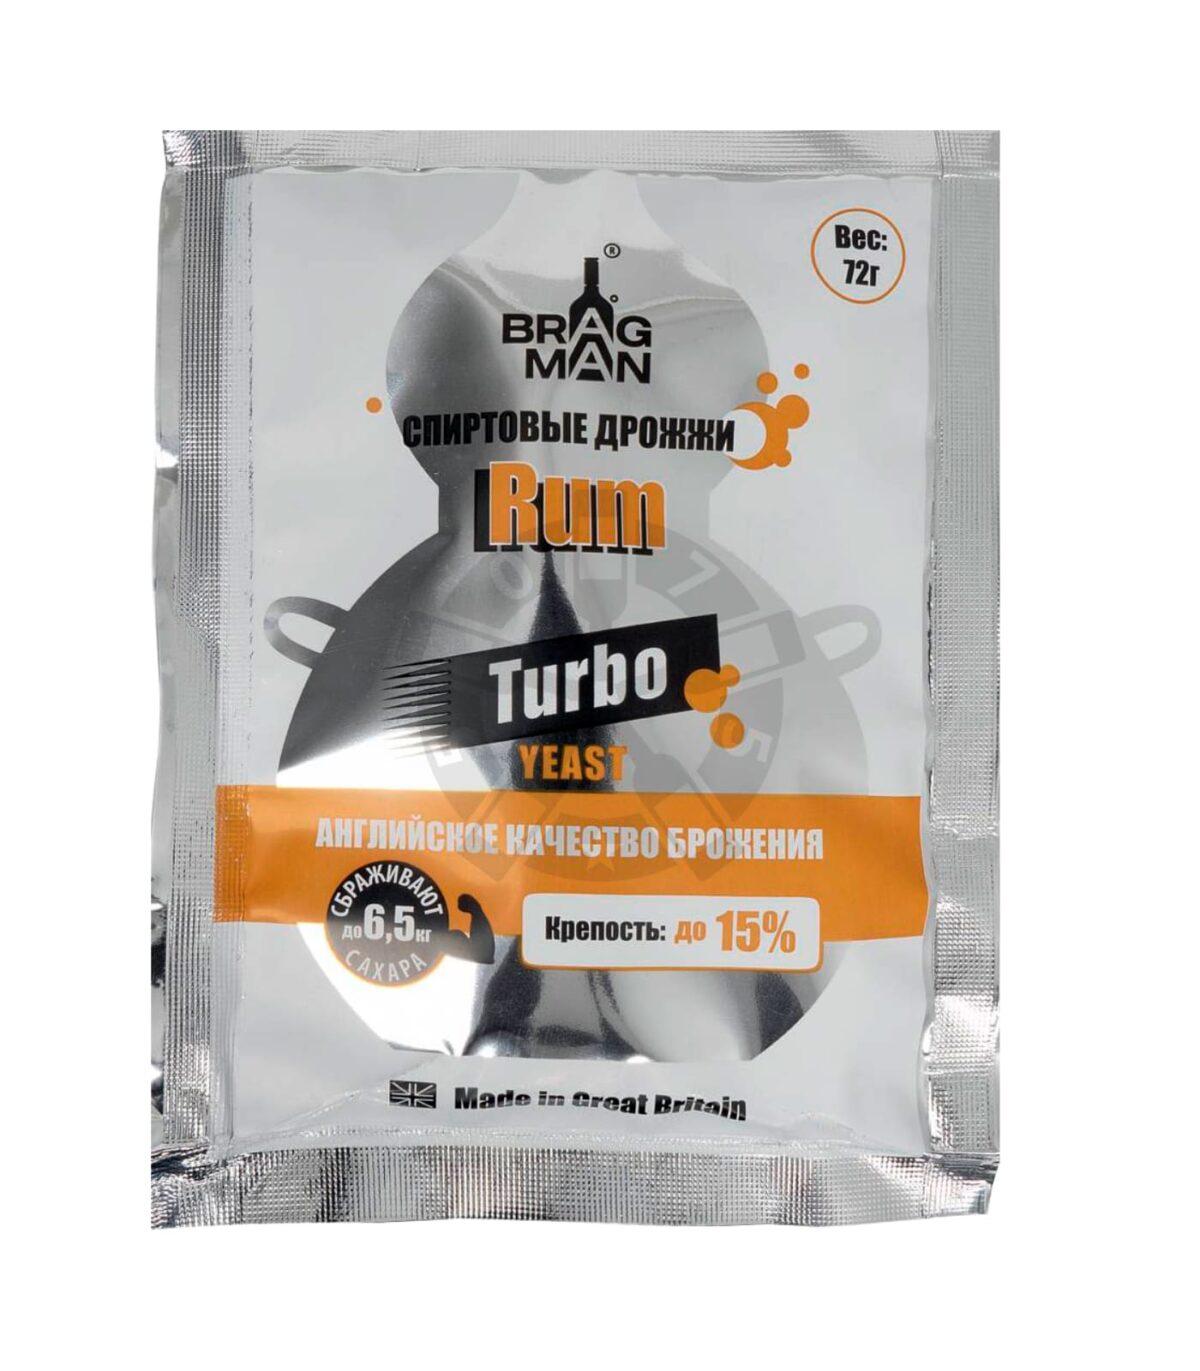 Спиртовые дрожжи Bragman «Rum Turbo», 72 г